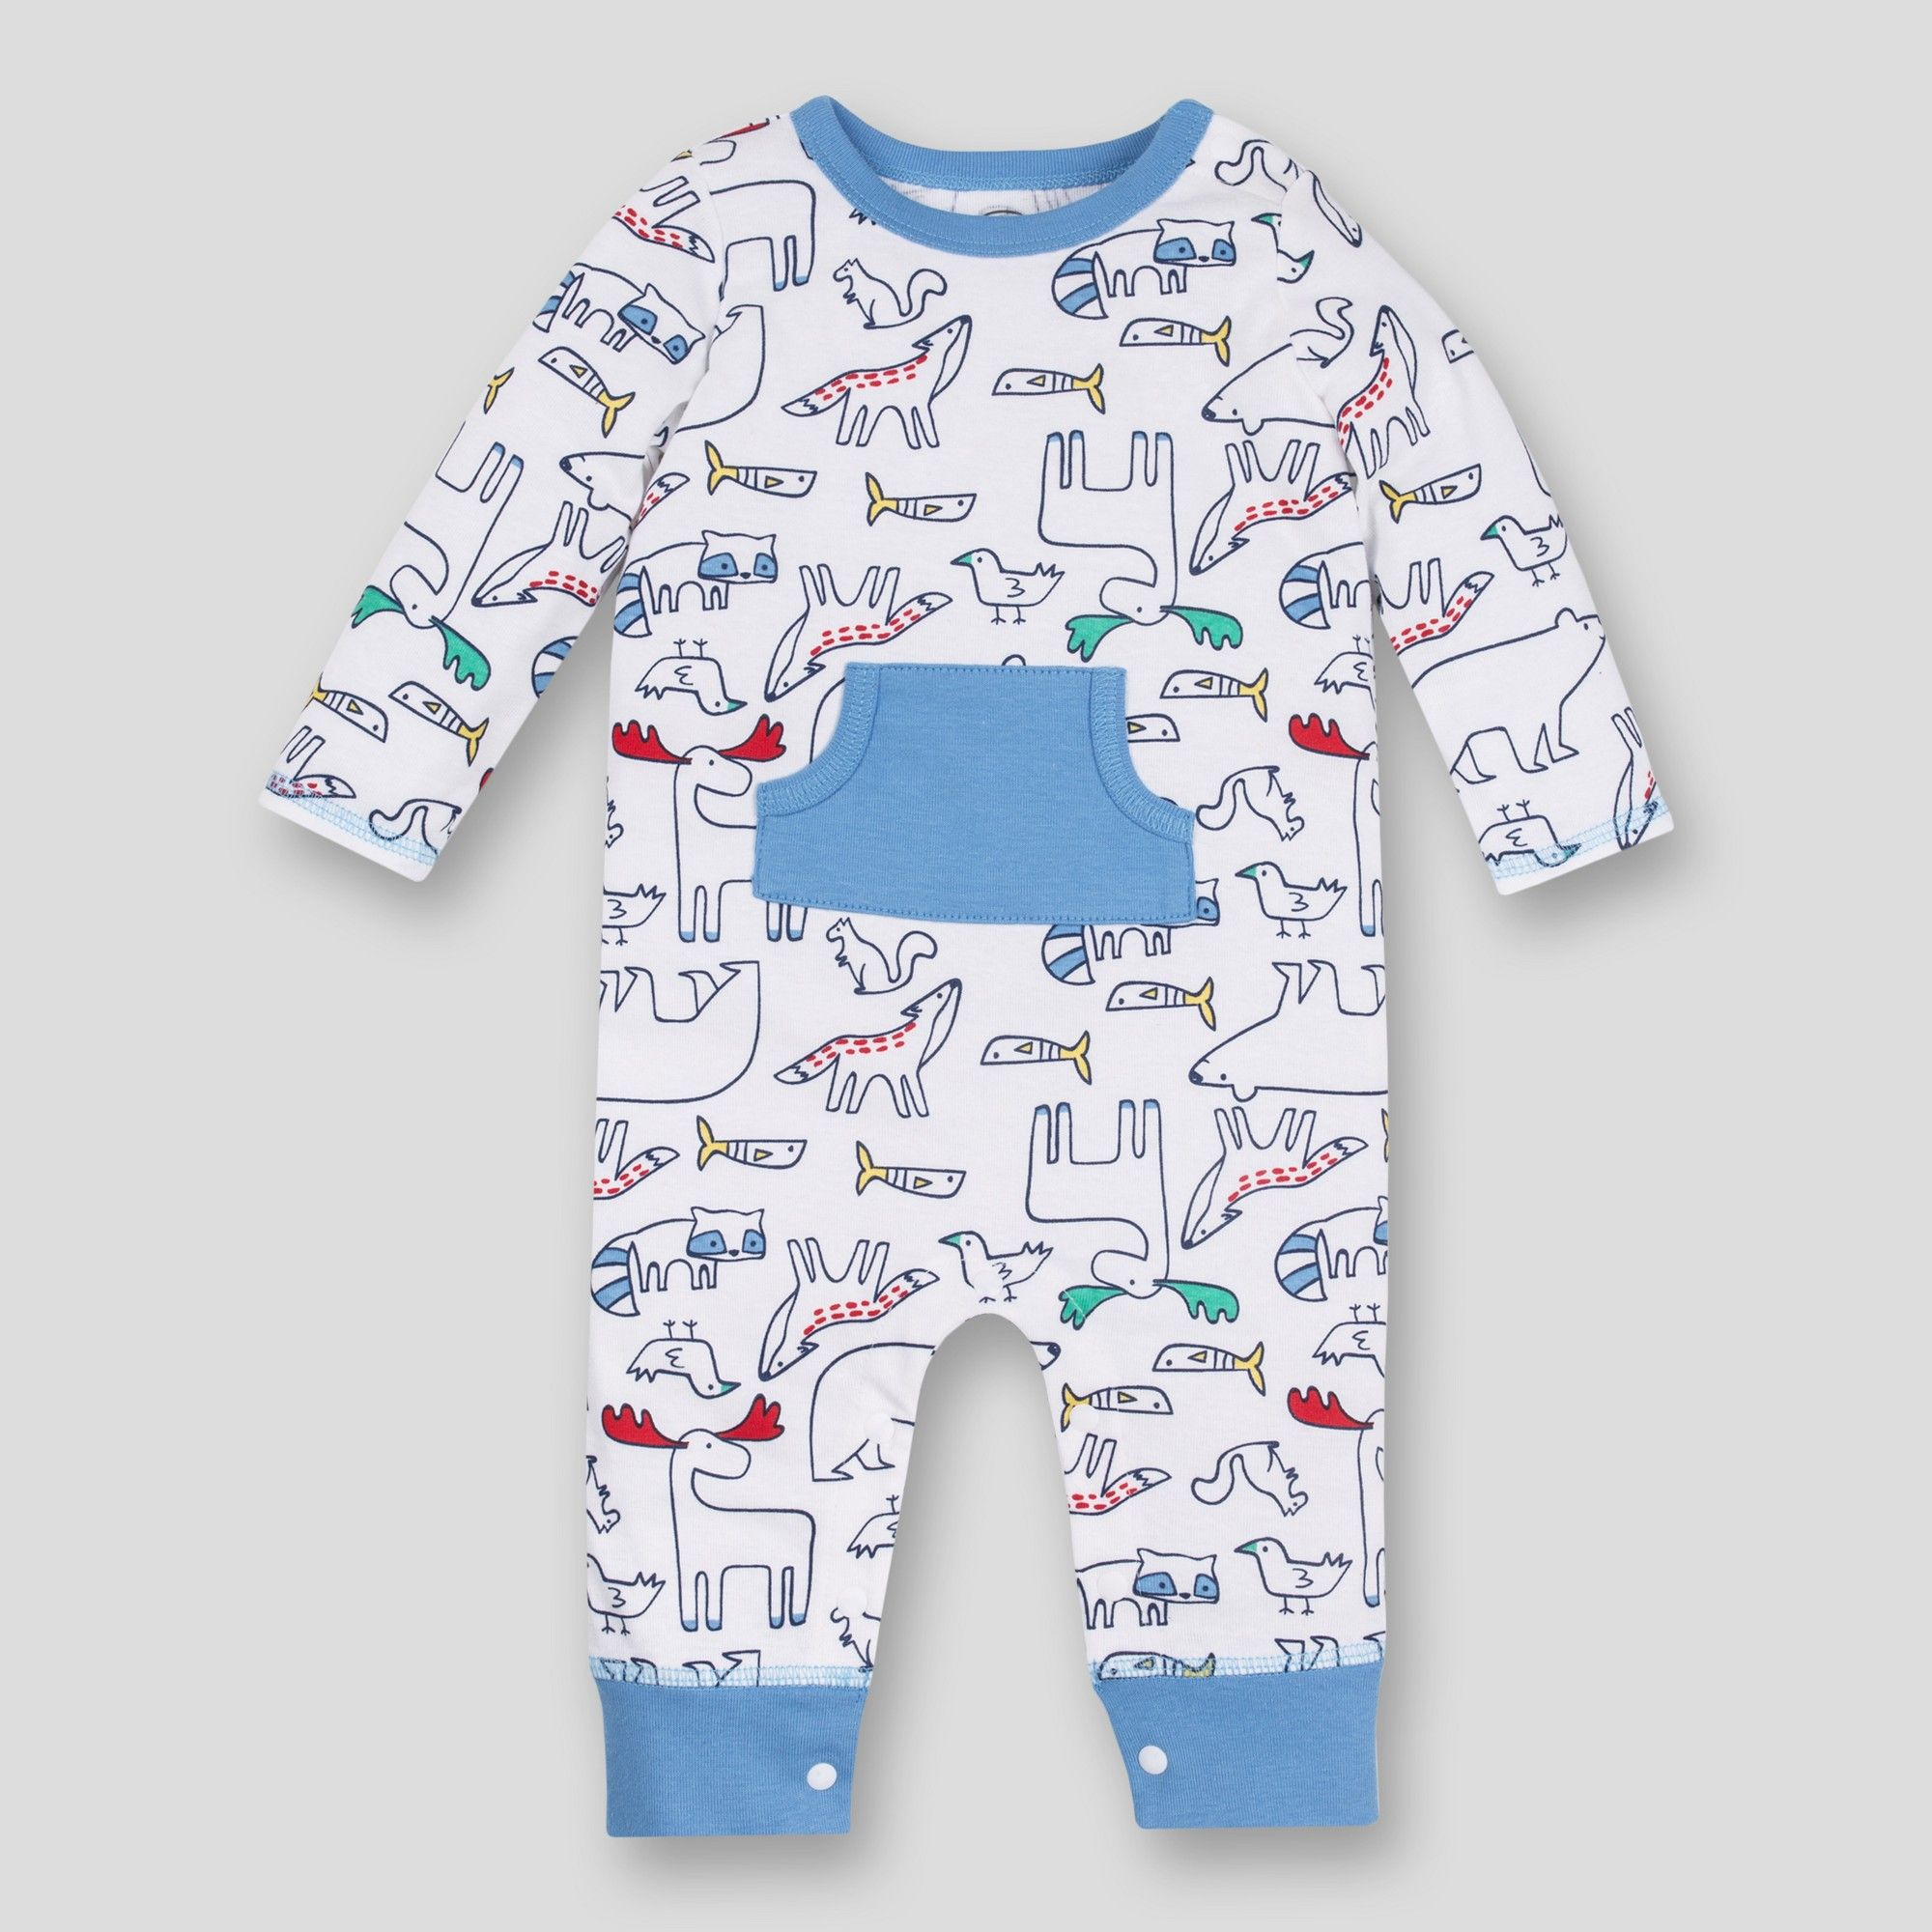 2e07afdfd Lamaze Baby Boys' Critter Romper - White 24M   Kids clothes ...